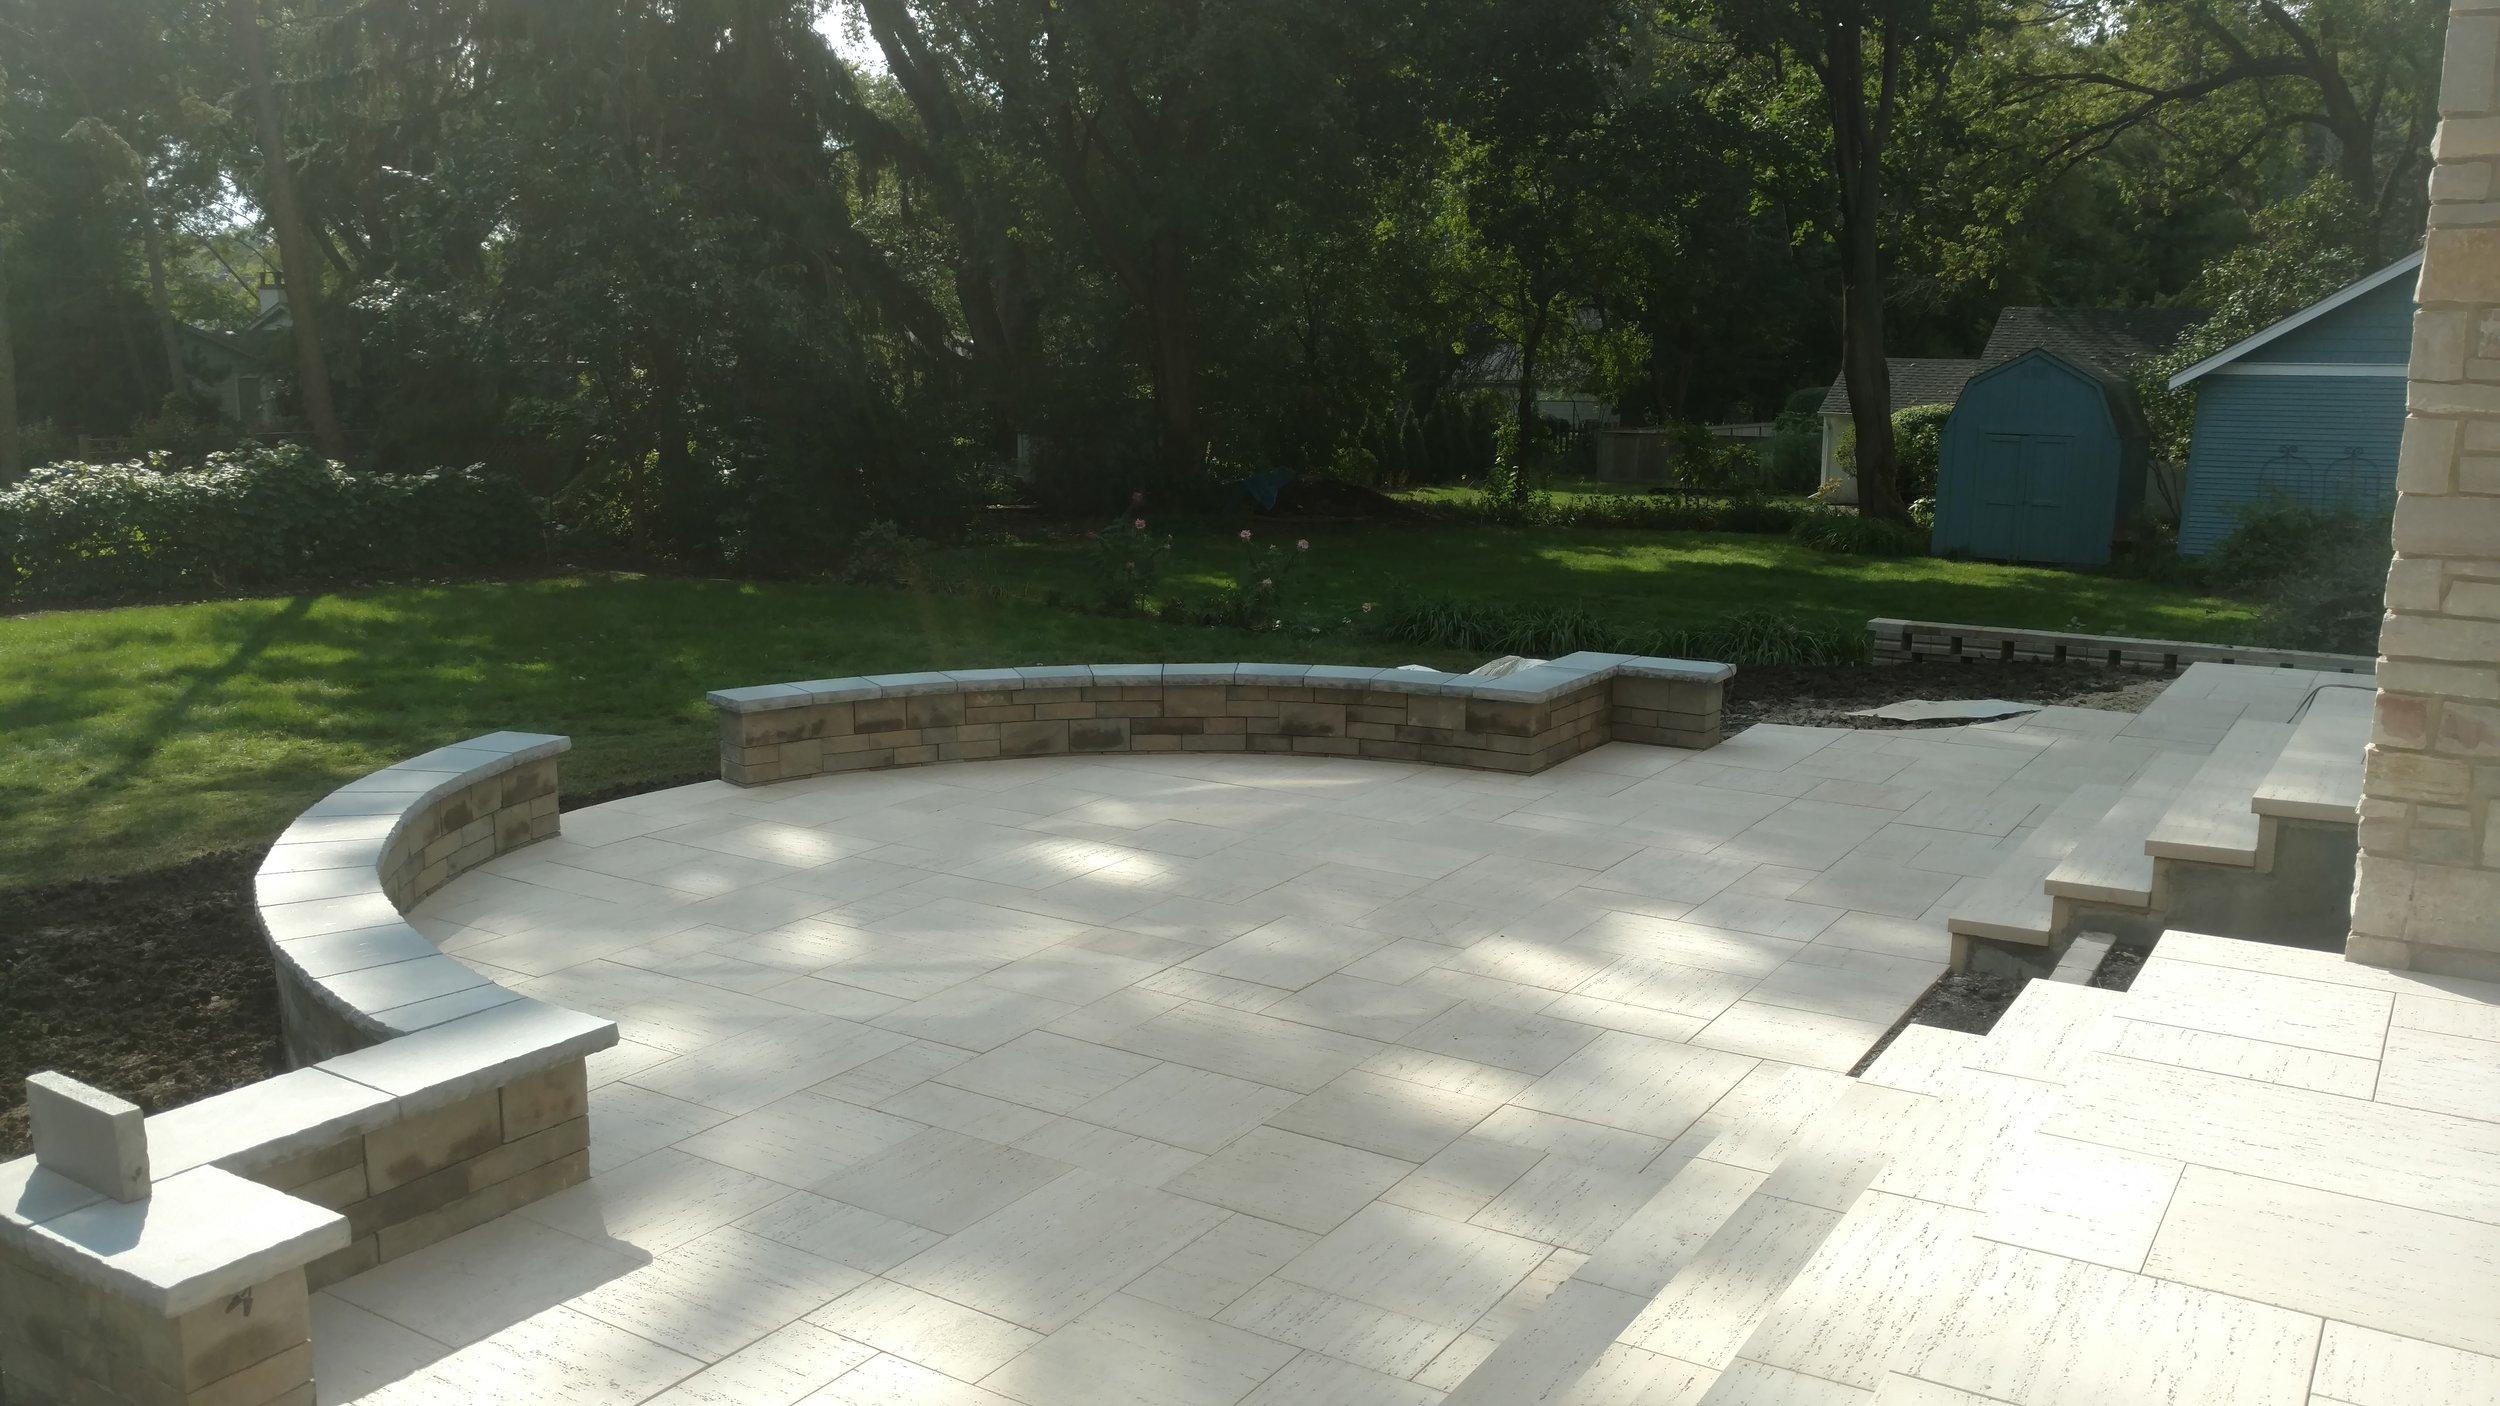 stone-brick-patio-and-retaining-wall-create